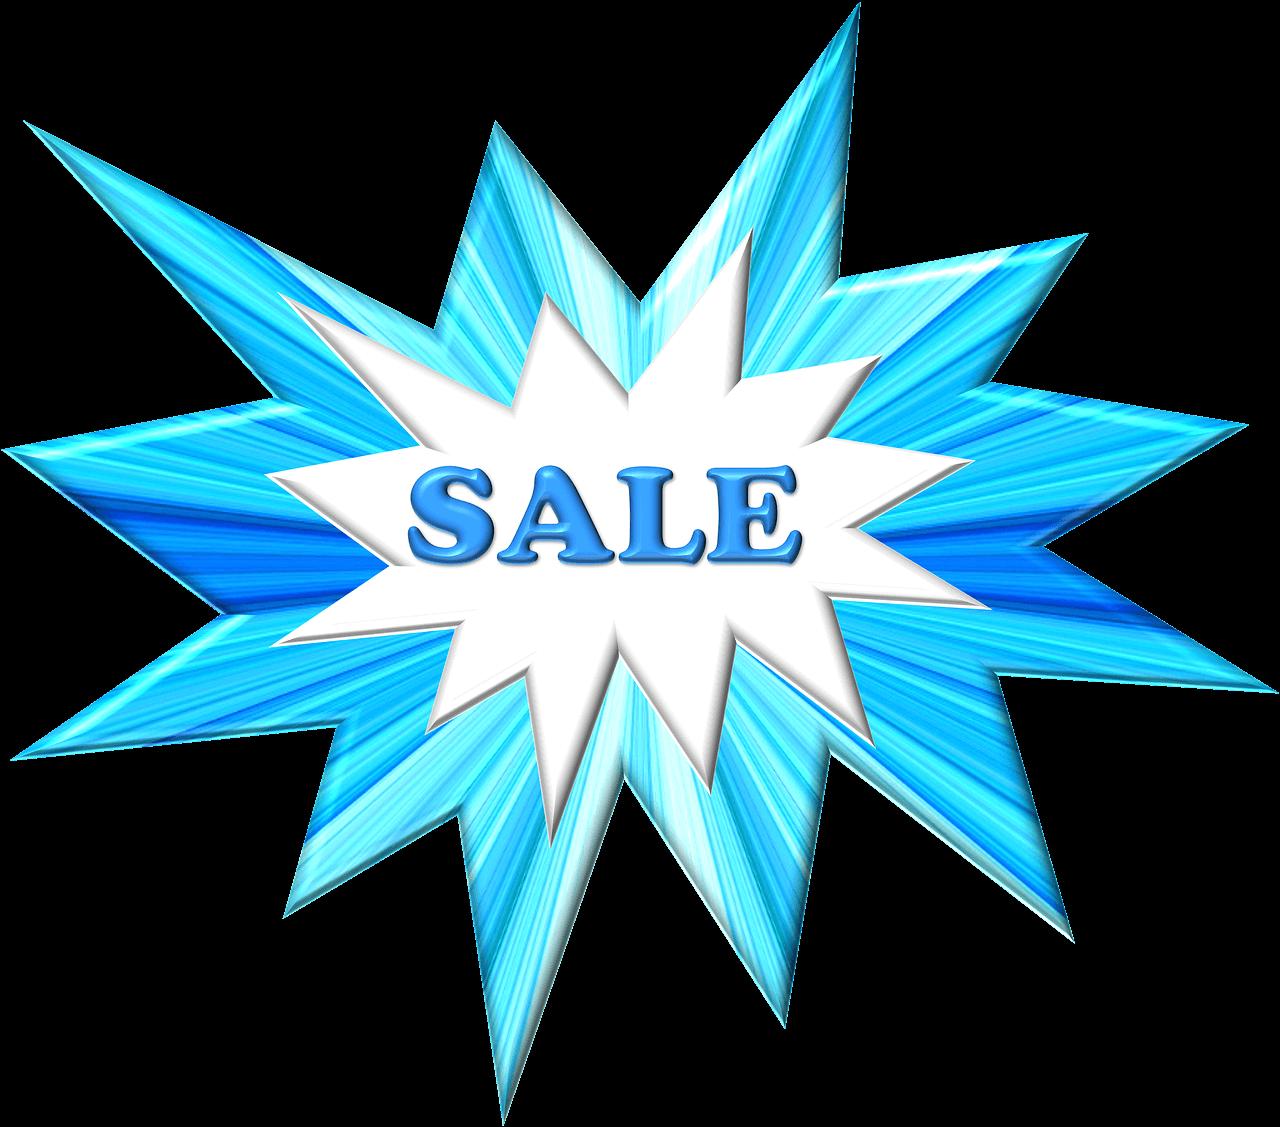 sales-1336002_1280